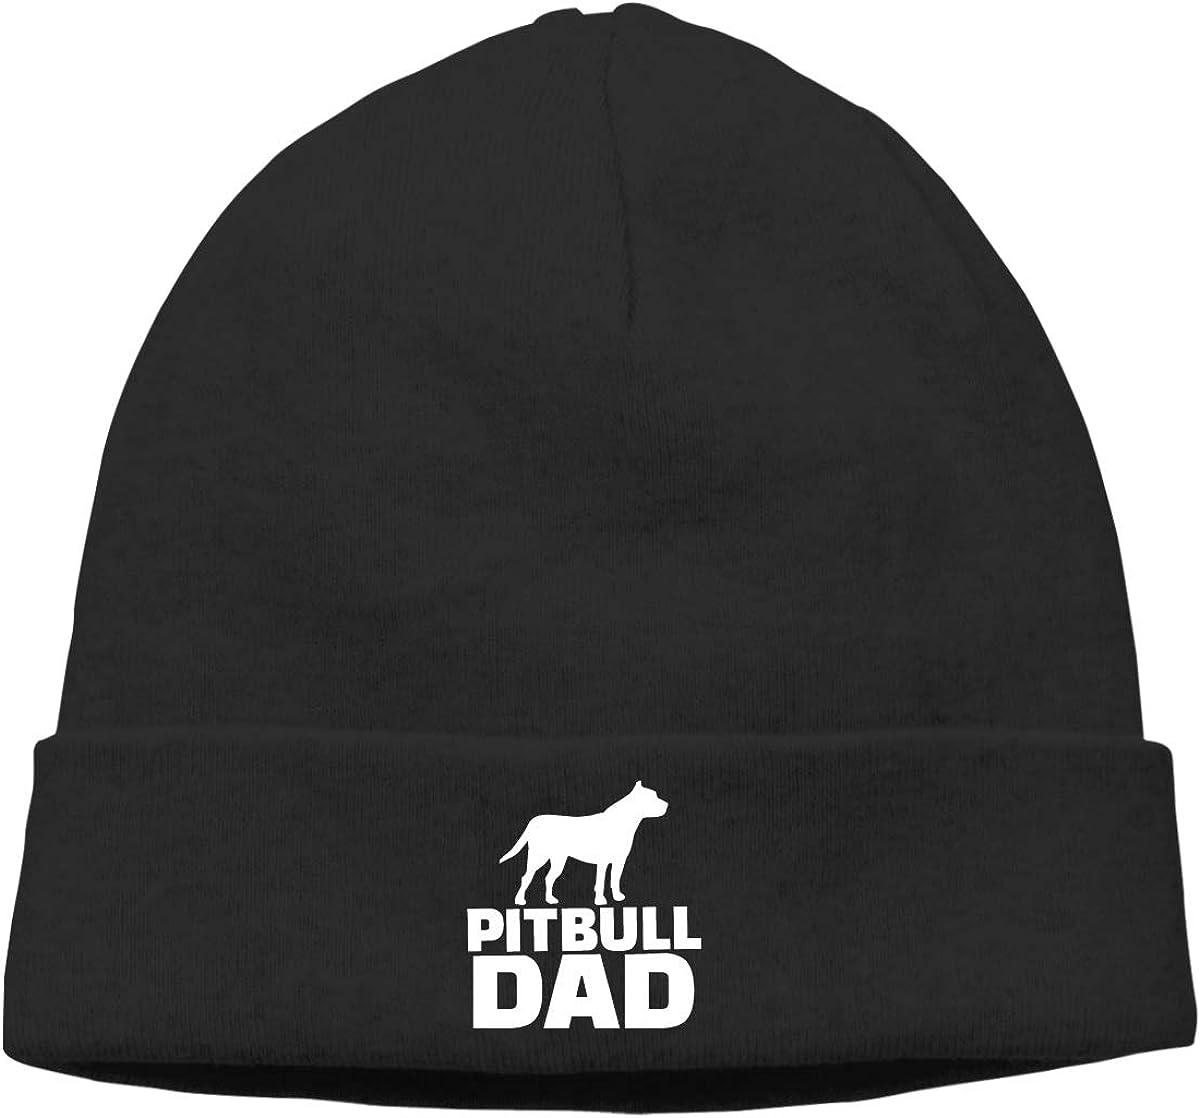 Pitbull DAD Beanie Hats Cap Men Winter Summer Warm /& Stylish Skull Cap Knit Cuff Beanie